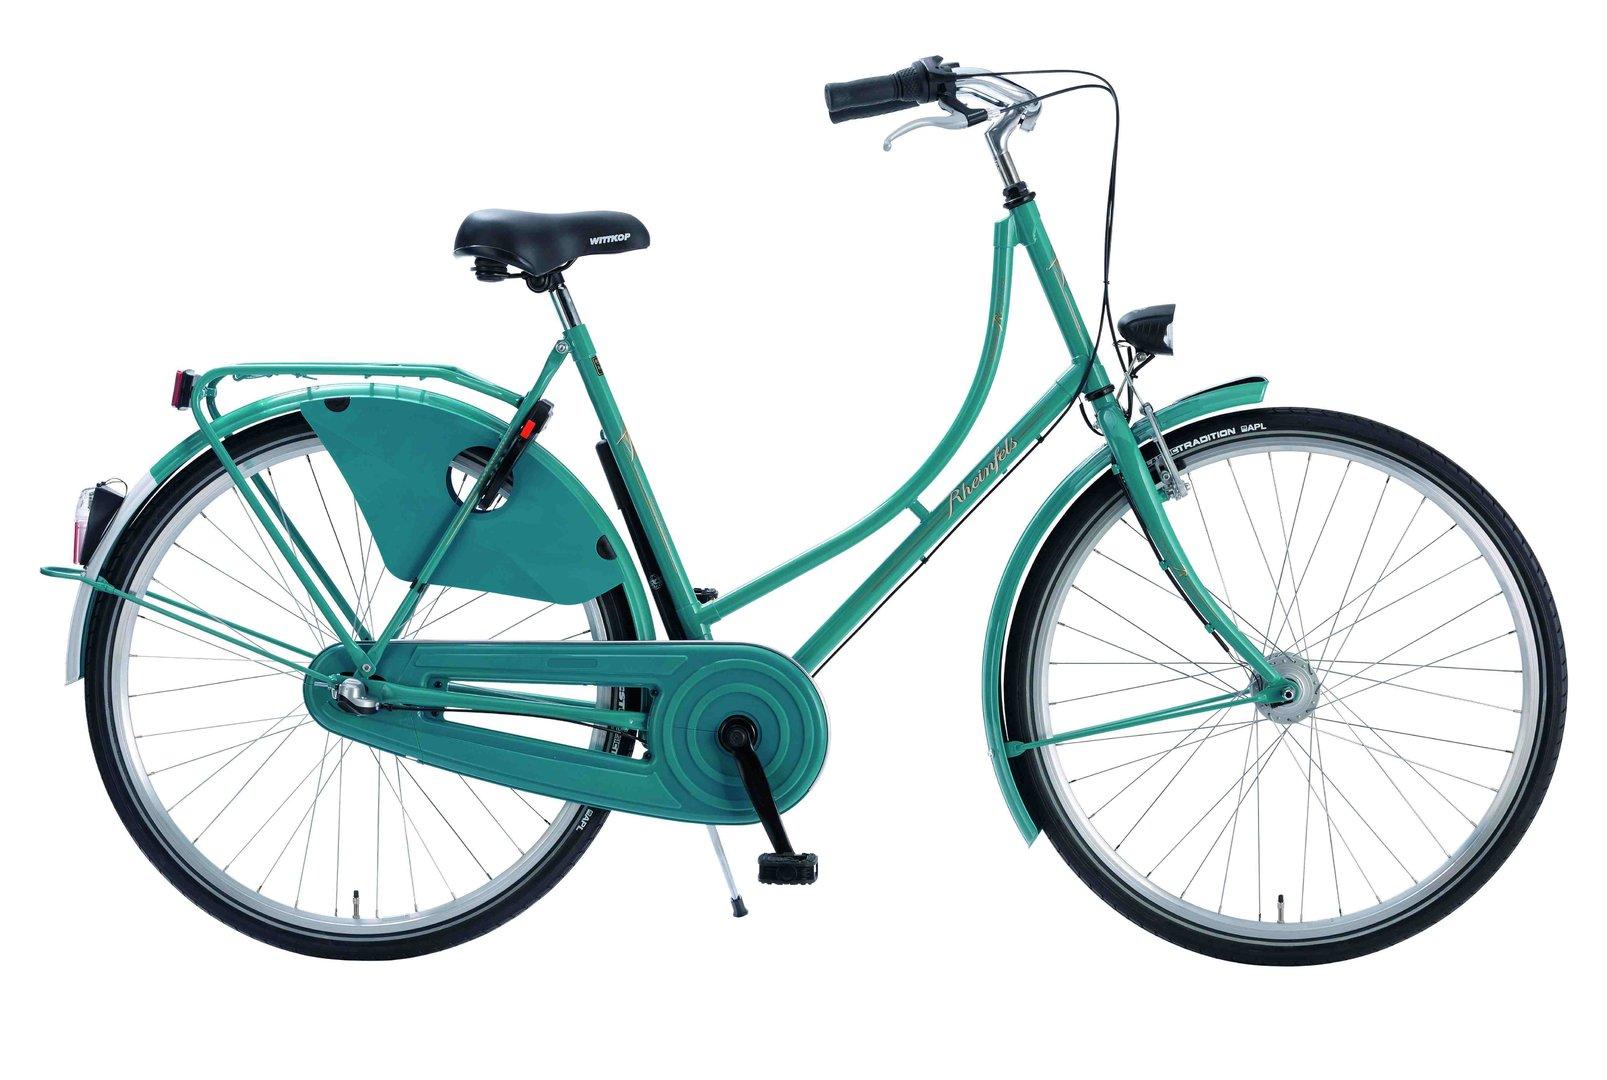 26 zoll rheinfels hollandrad 3 gang mit nabendynamo wasserblau fahrrad ass. Black Bedroom Furniture Sets. Home Design Ideas